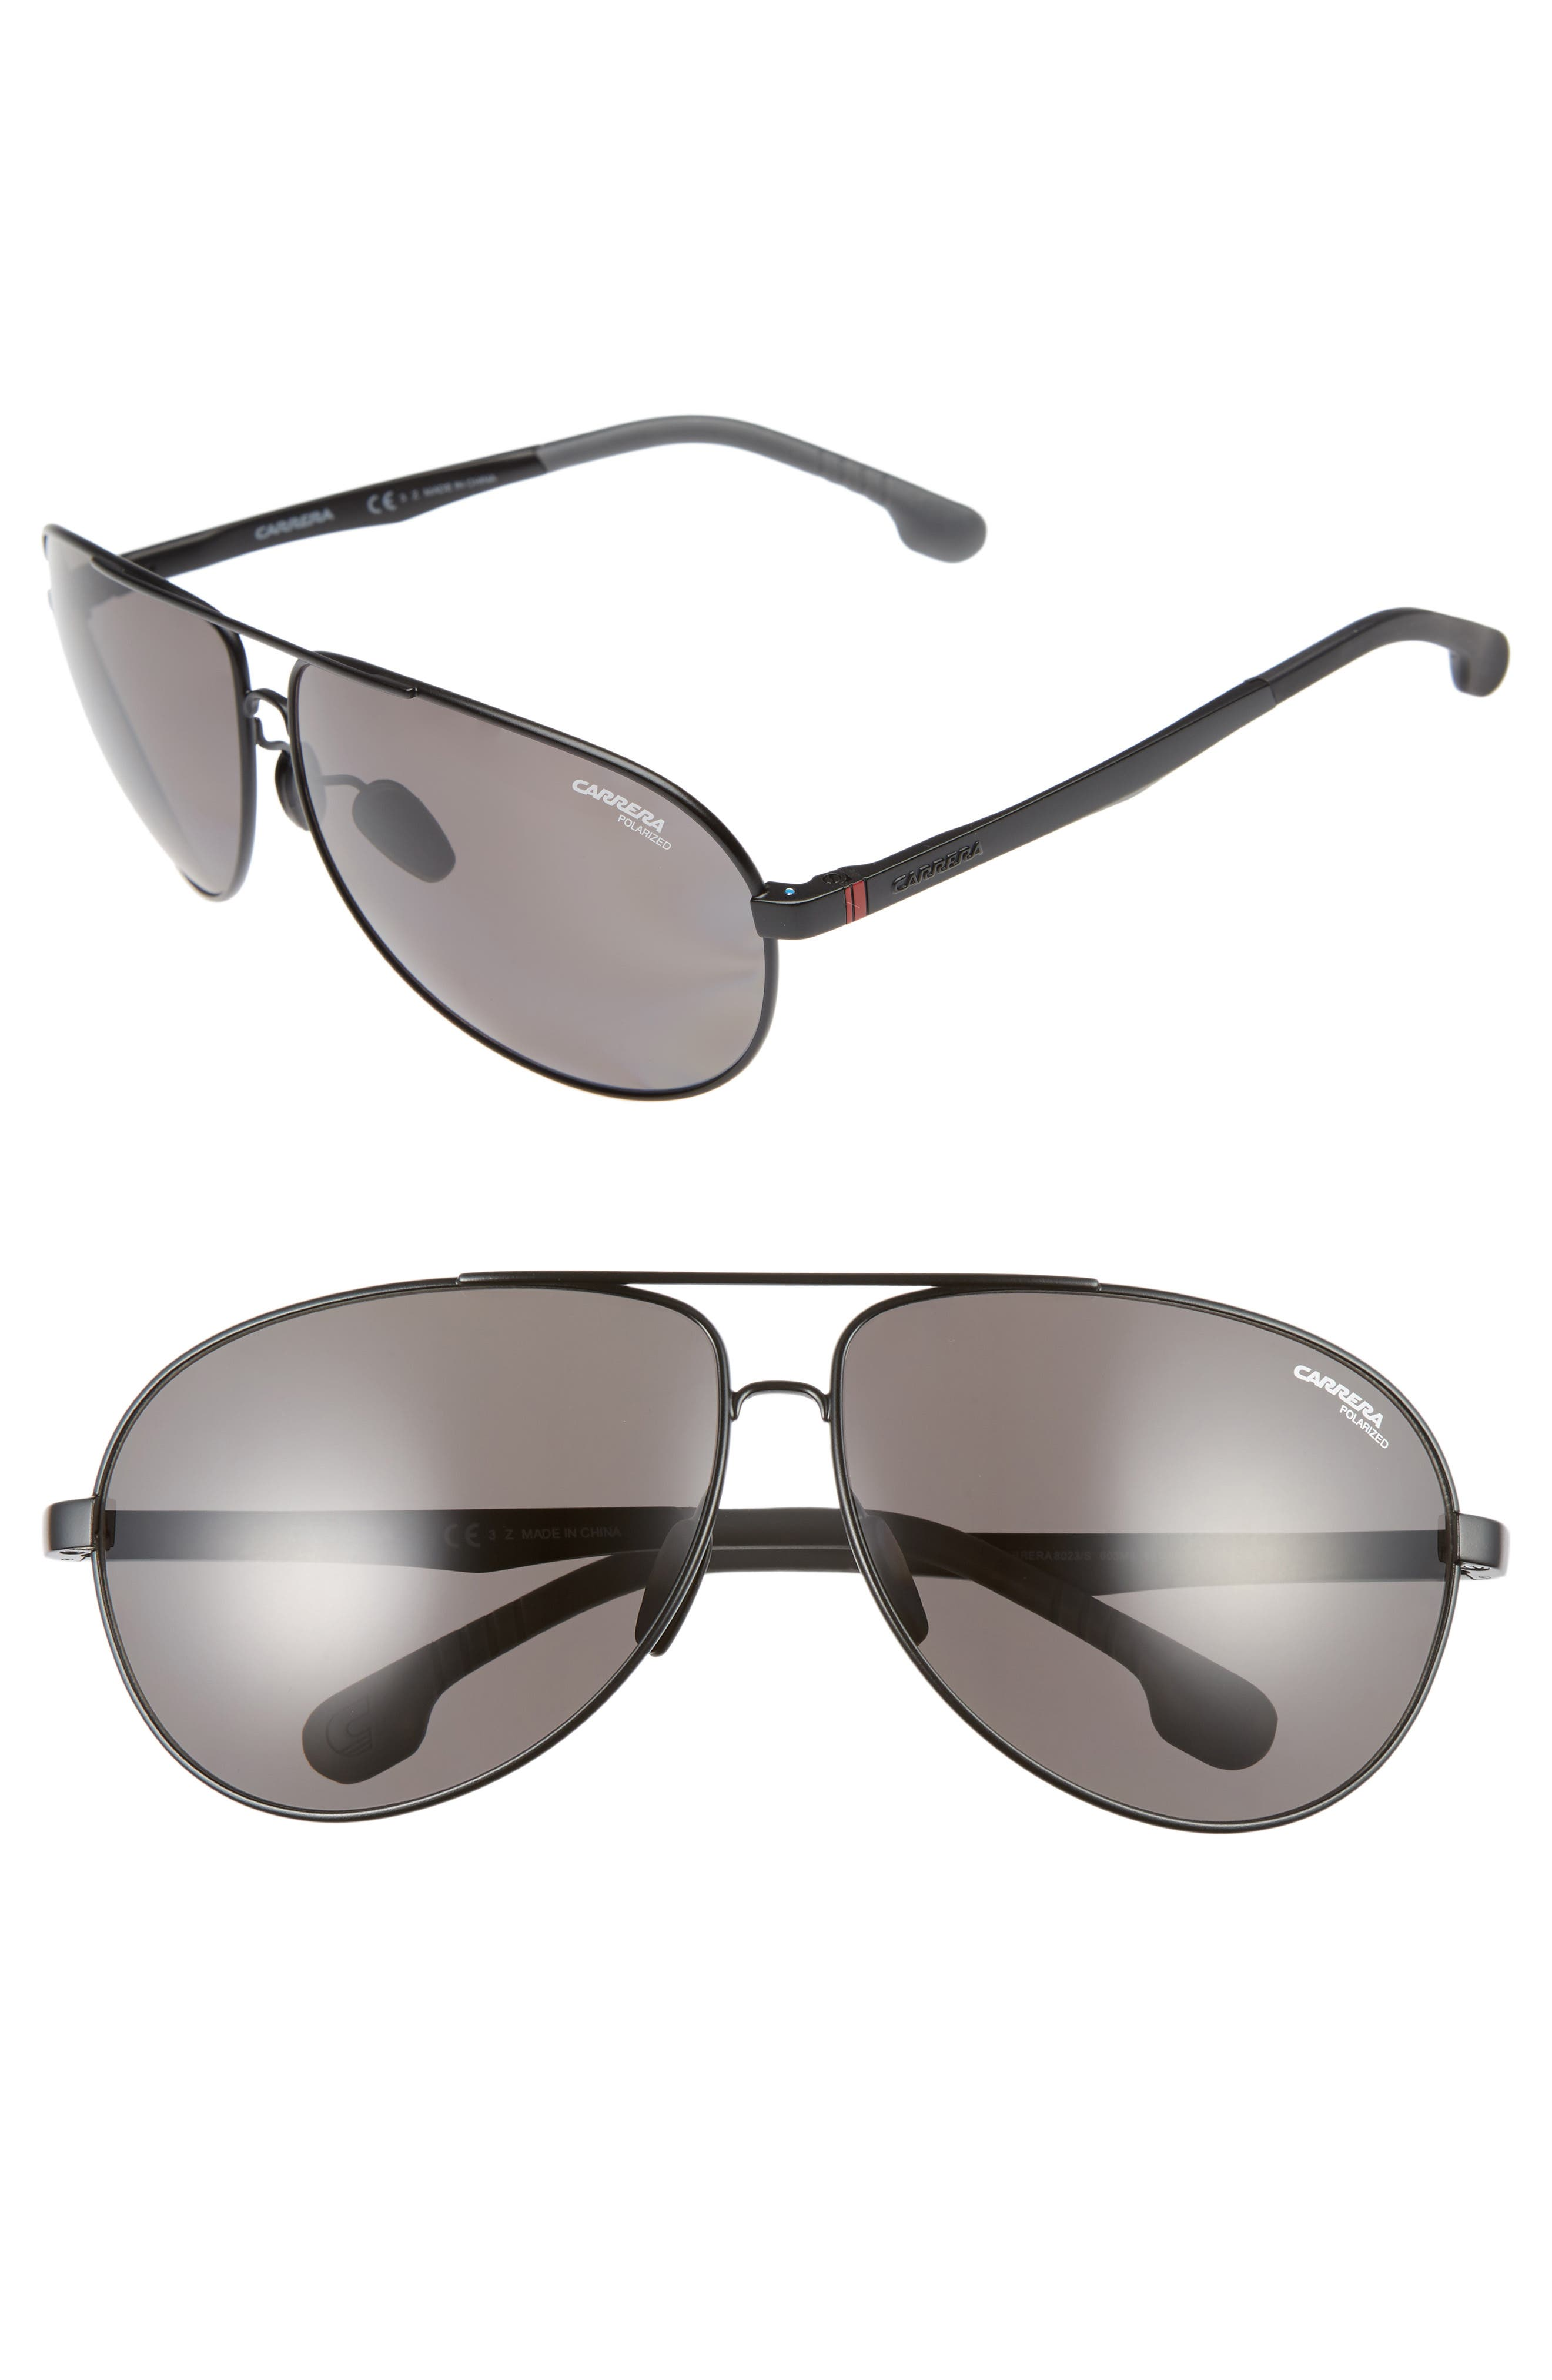 Carrera Eyewear 6m Polarized Sunglasses - Matte Black/ Grey